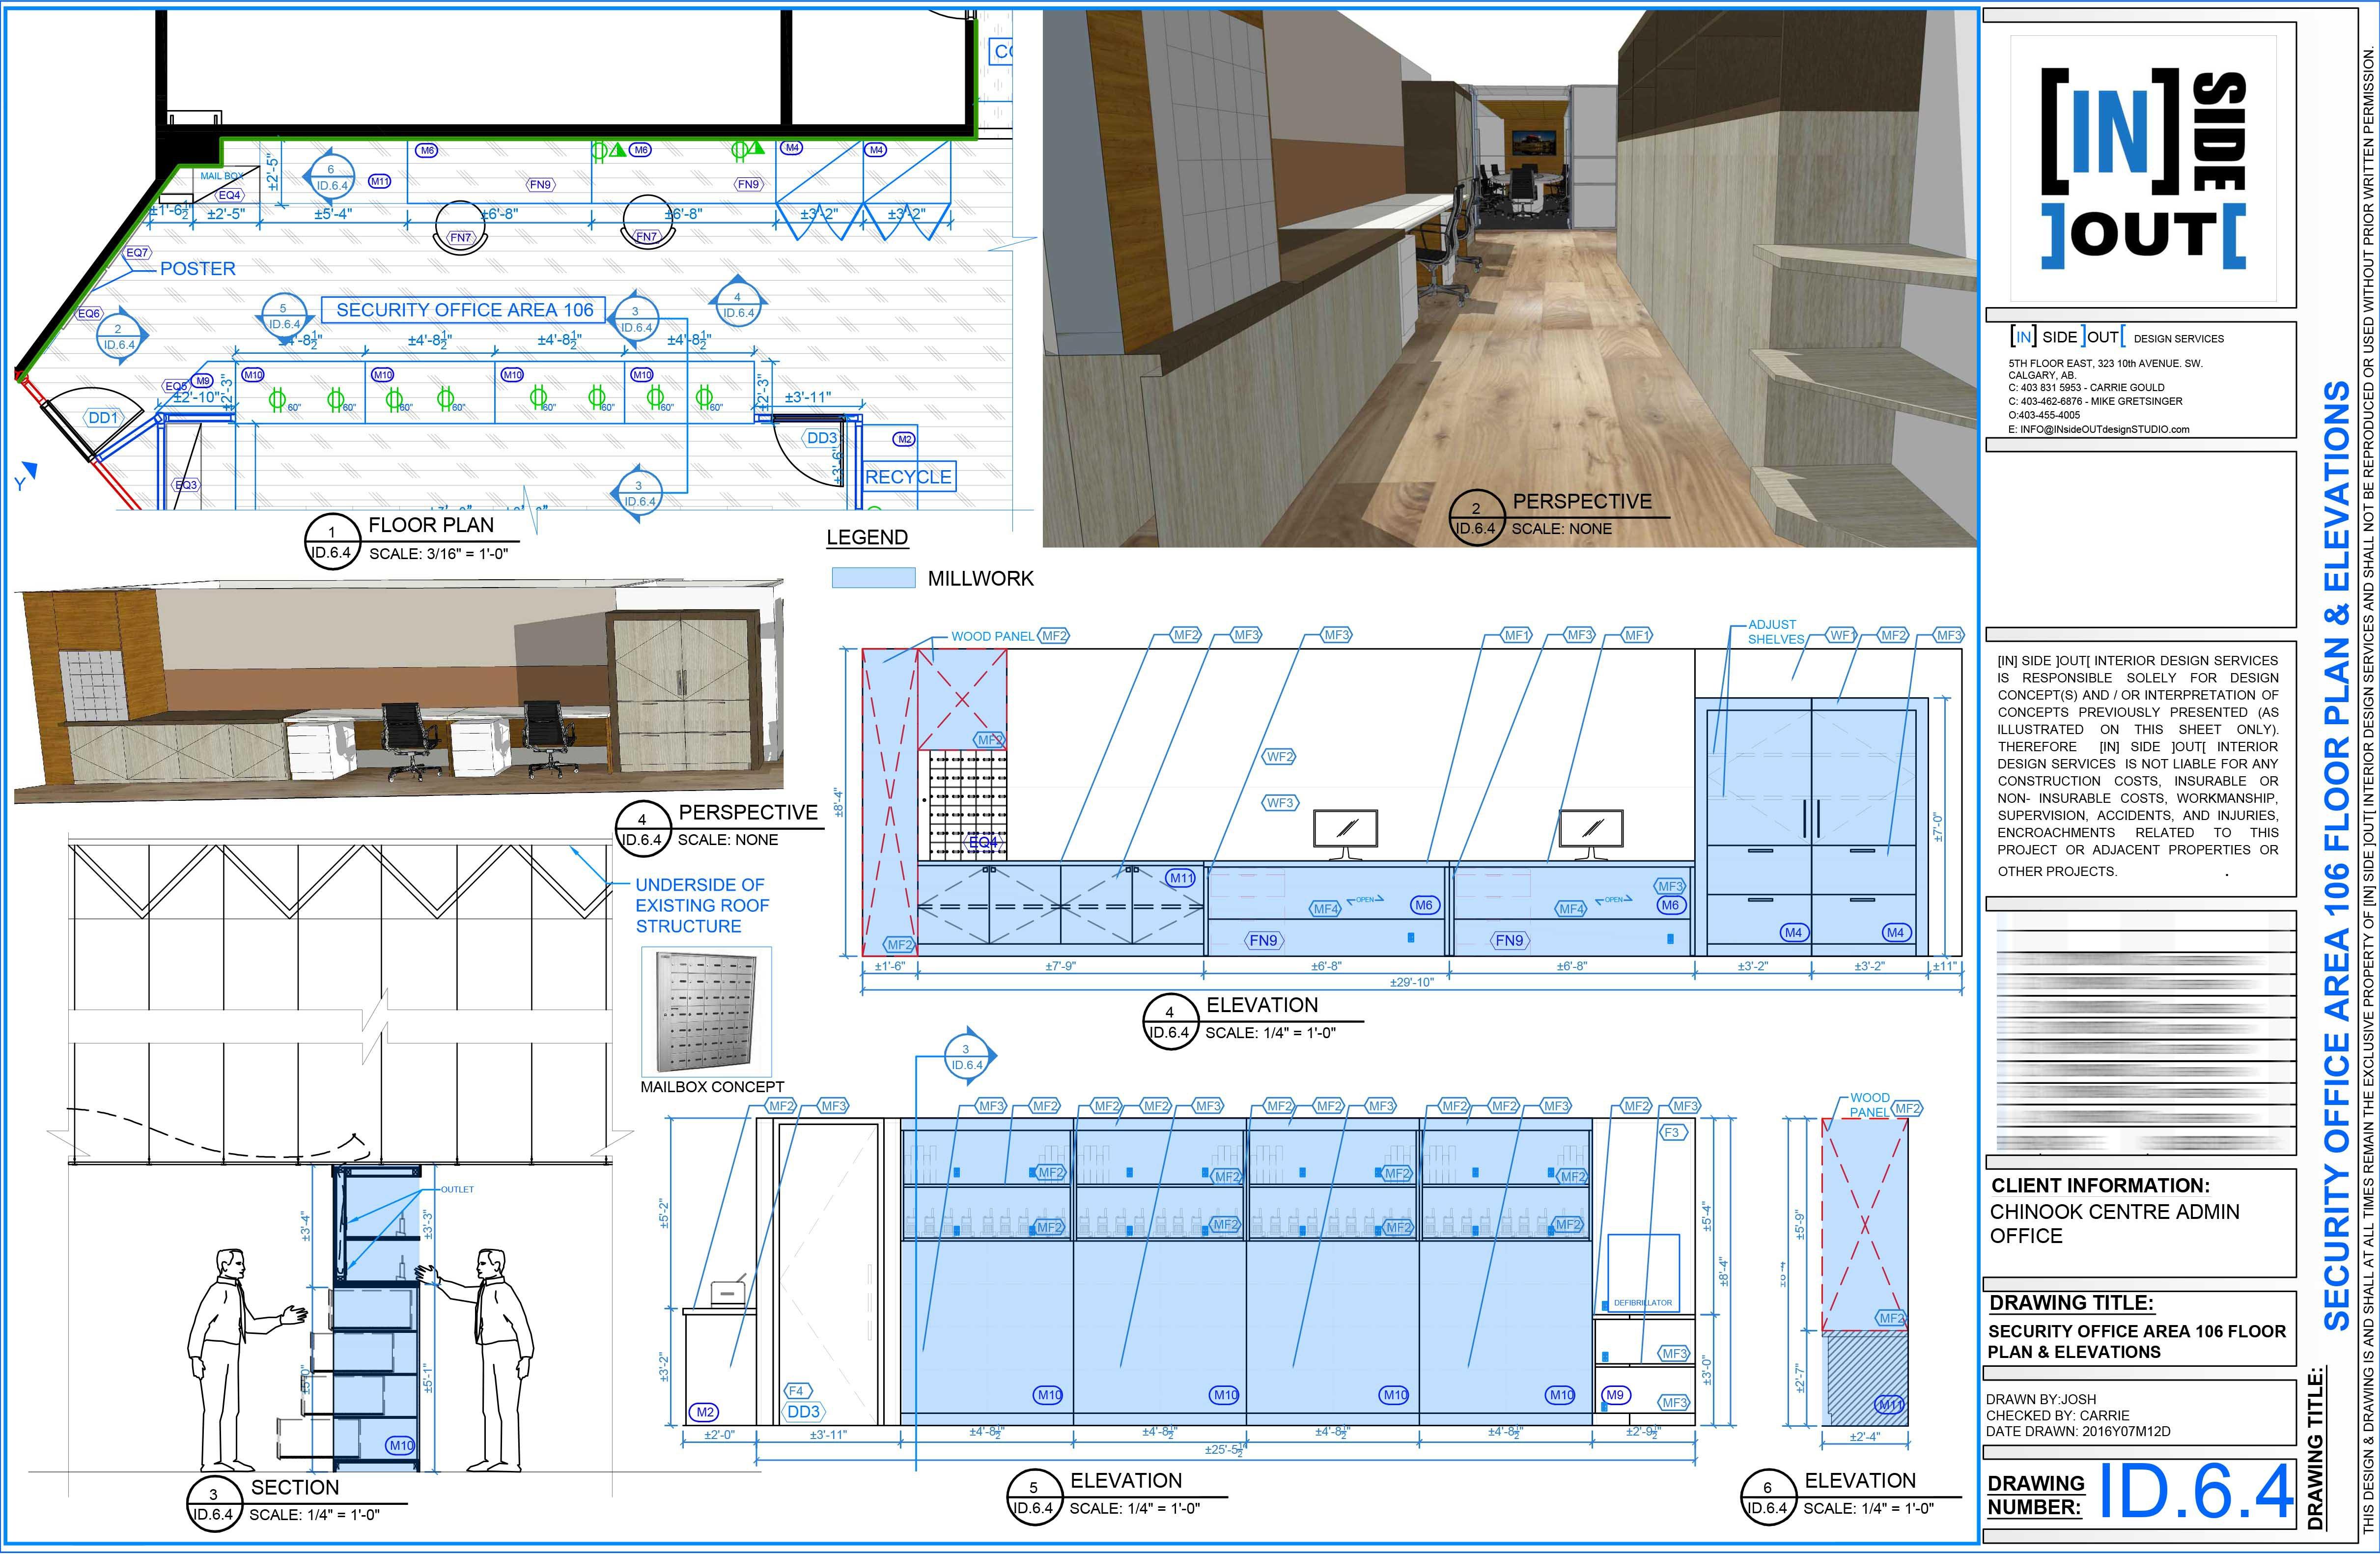 Drawn office admin office CAD CAD CONCEPT STUDIO DESIGN